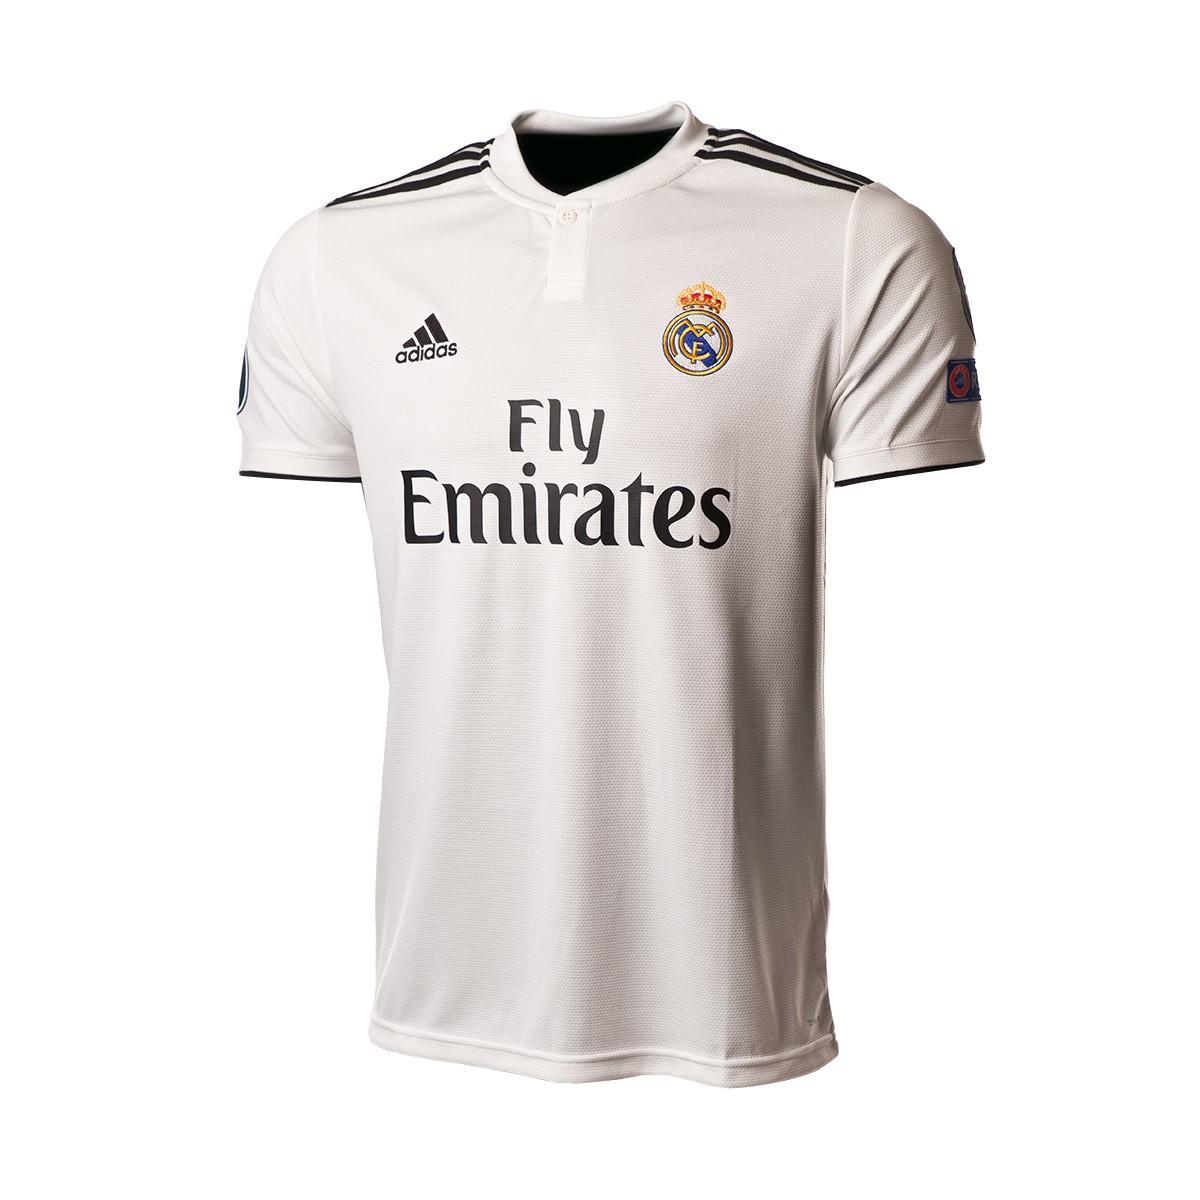 new product dbec1 d07c8 Camiseta Real Madrid UCL Primera Equipación 2018-2019 Core white-Black